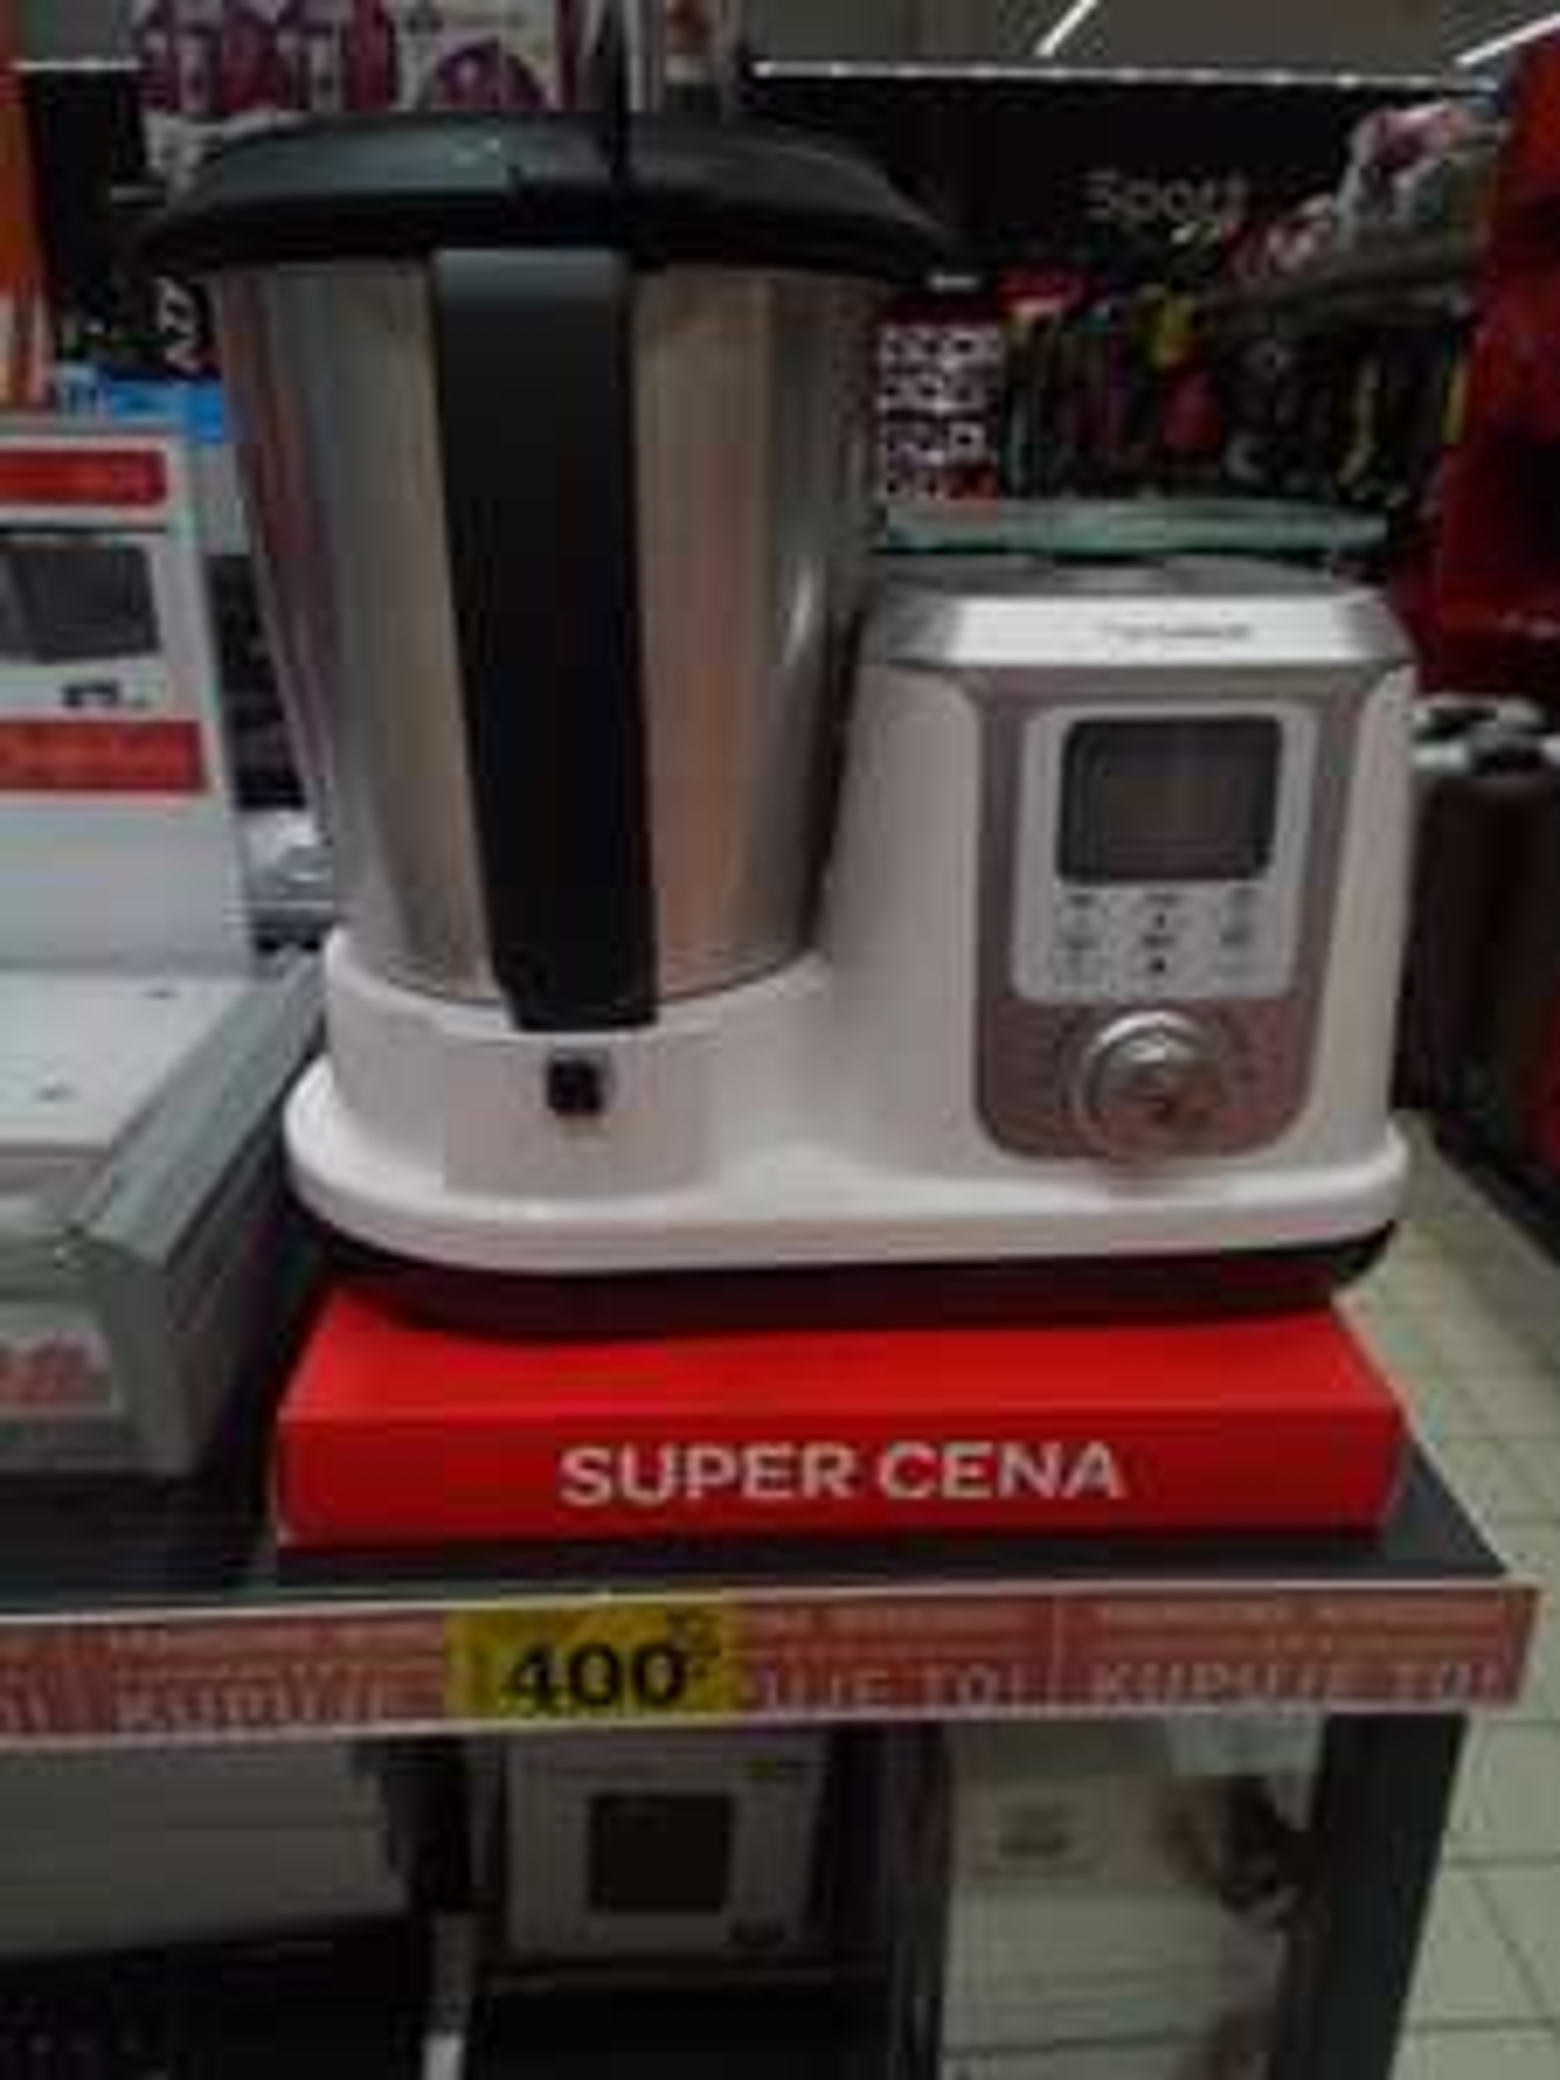 Kalorik thermomaster HA1016 multicooker Carrefour białystok